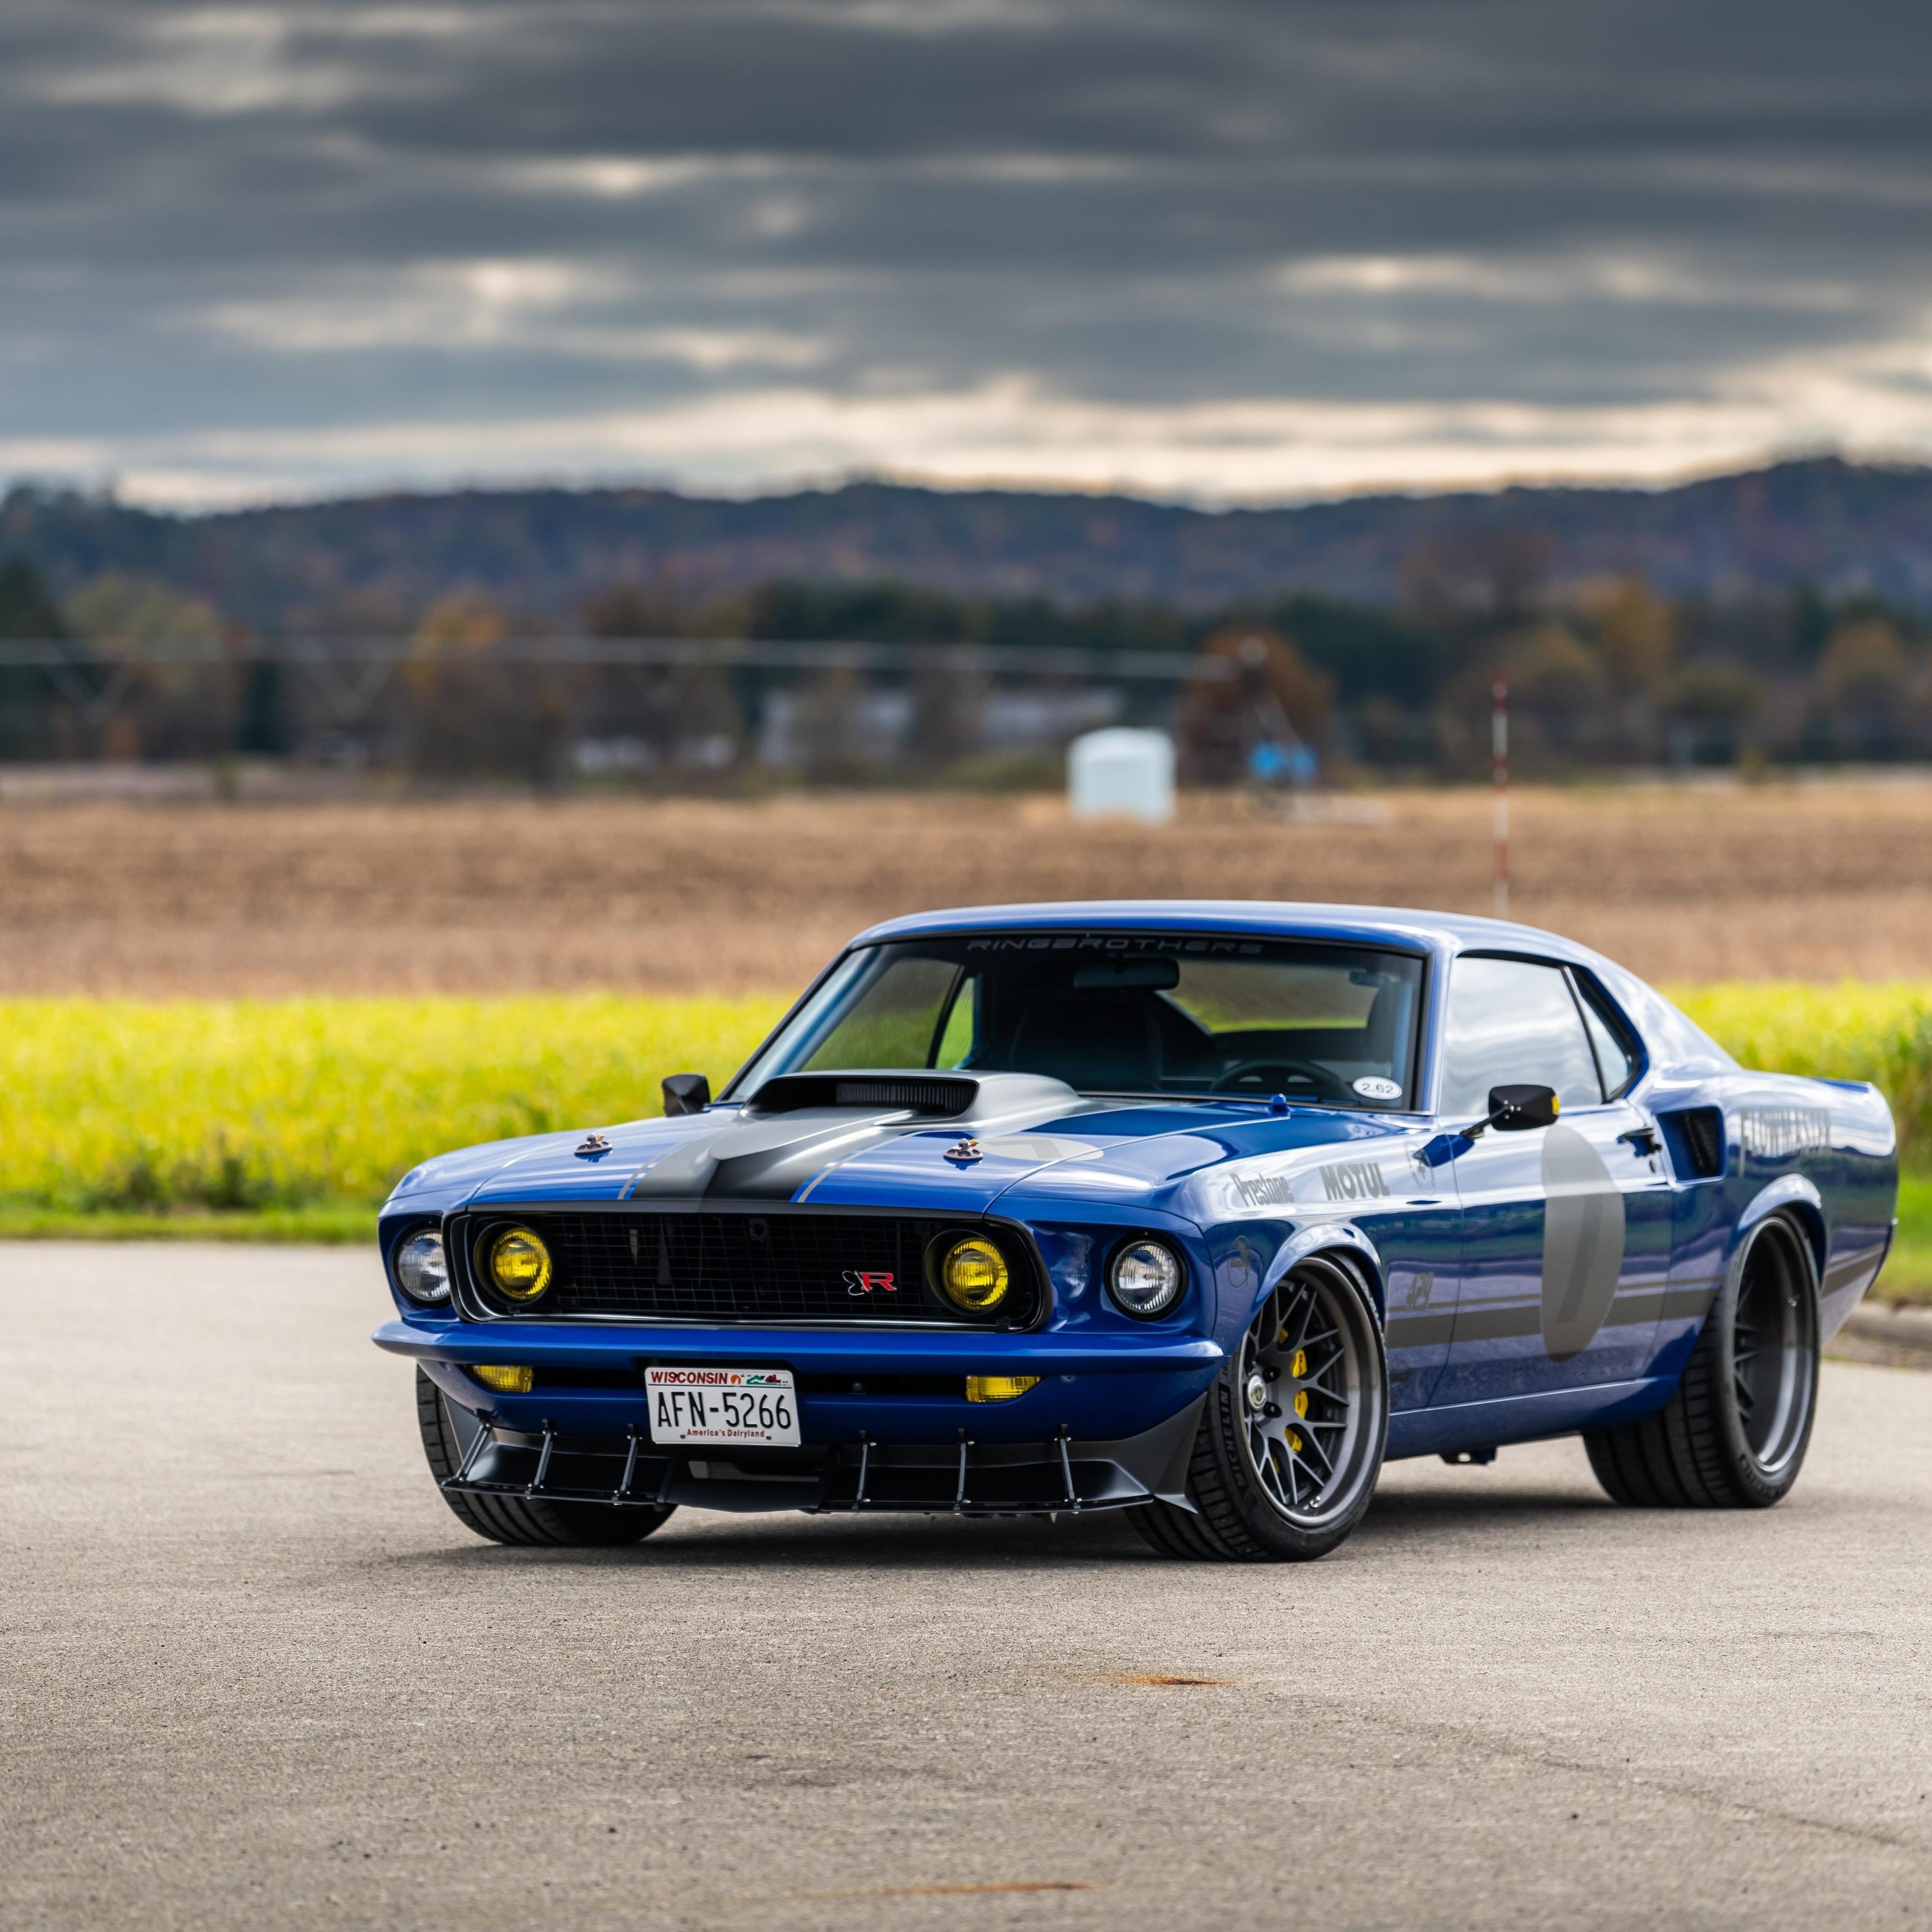 ford-mustang-muscle-car-8k-ni.jpg